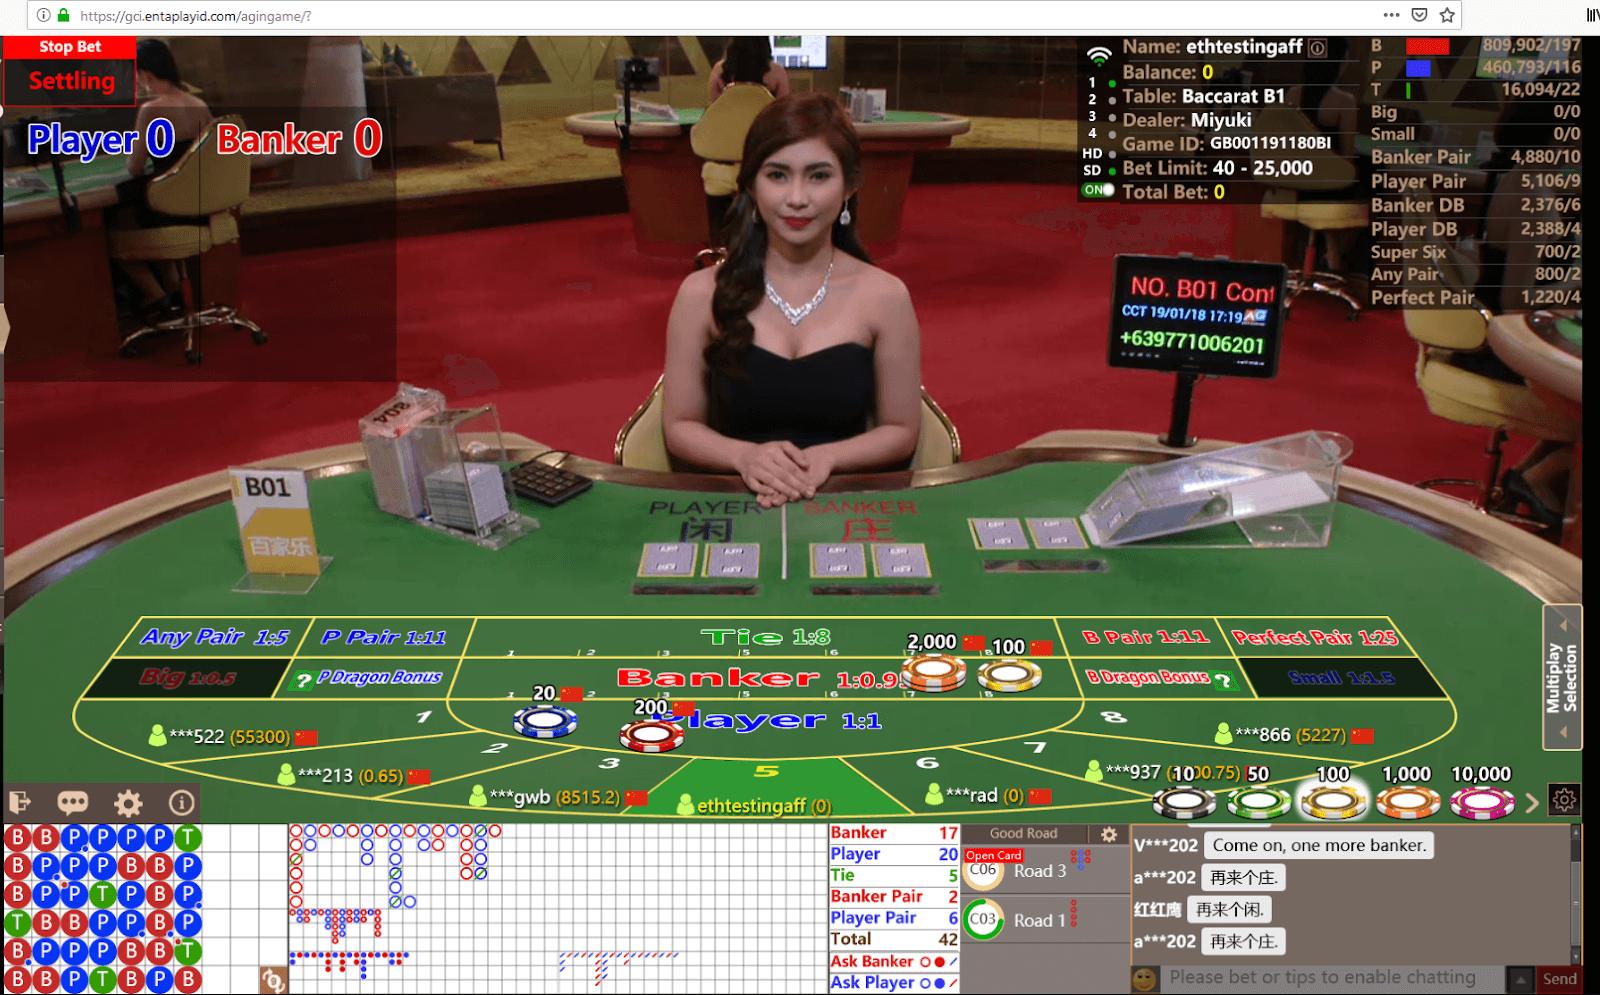 Entaplay casino